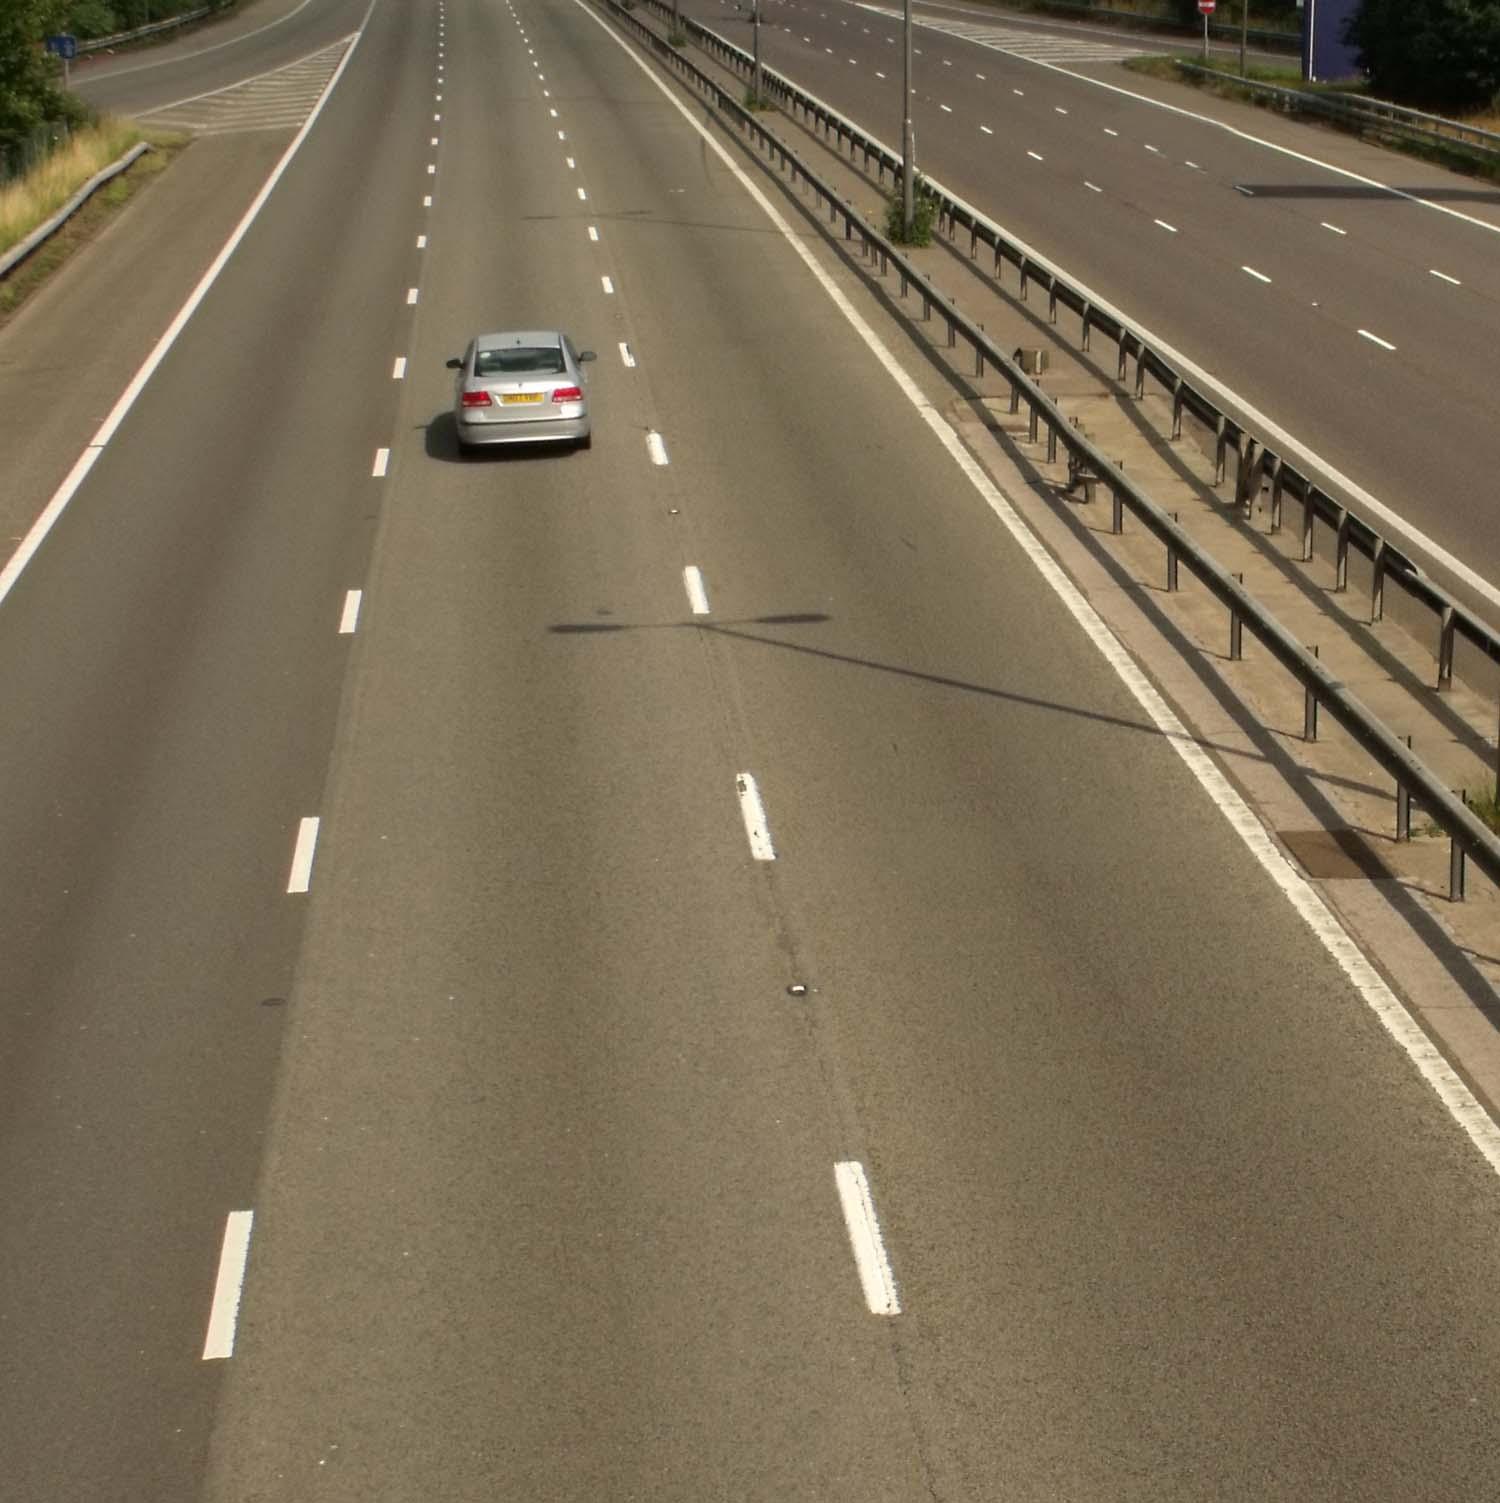 M1,Watford,Gap,services,UK,Hertfordshire,road,motorway,365days,west,midlands,england,britain,GB,europe,english,tonysmith,tony,smith,auto,autos,automobile,automobiles,vehicle,vehicles,hotpix!,#tonysmithhotpix,hotpix.rocketmail.com,hotpixuk.rocketmail.com,contact.tony.smith.gmail.com,tony.smith.gmail.com,tonys@miscs.com,tony.smith@mis-ams.com